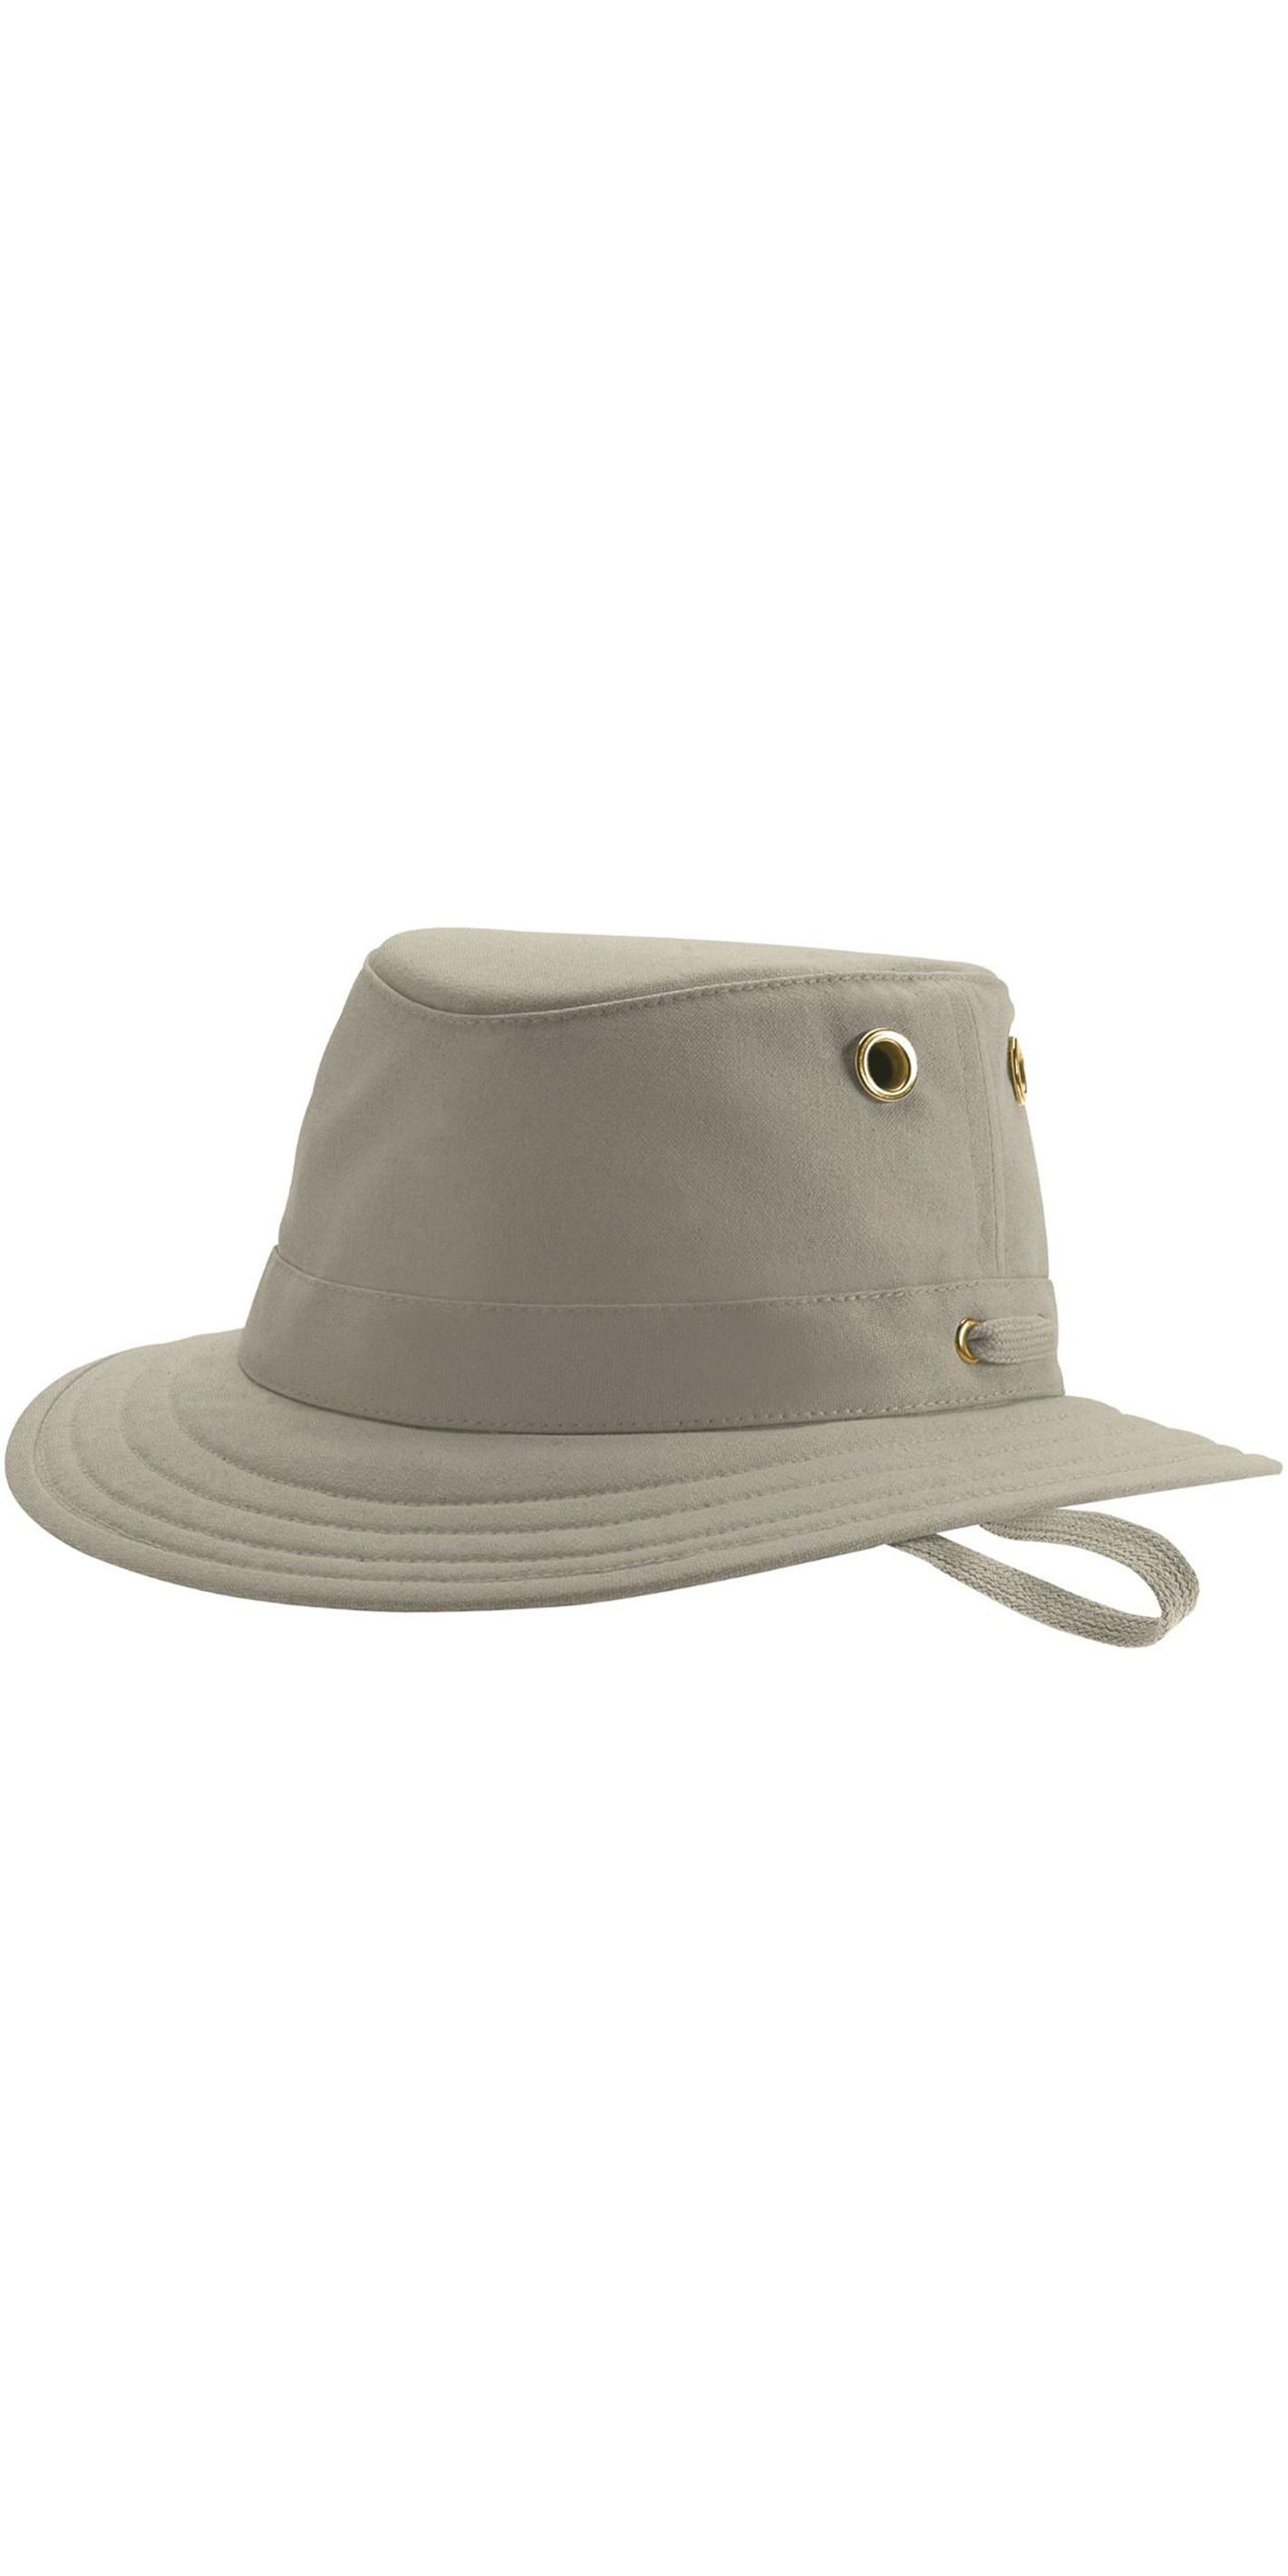 cdc6201eff819 2019 Tilley T5 algodão Duck Brimmed Hat - KHAKI OLIVE - Chapéus ...